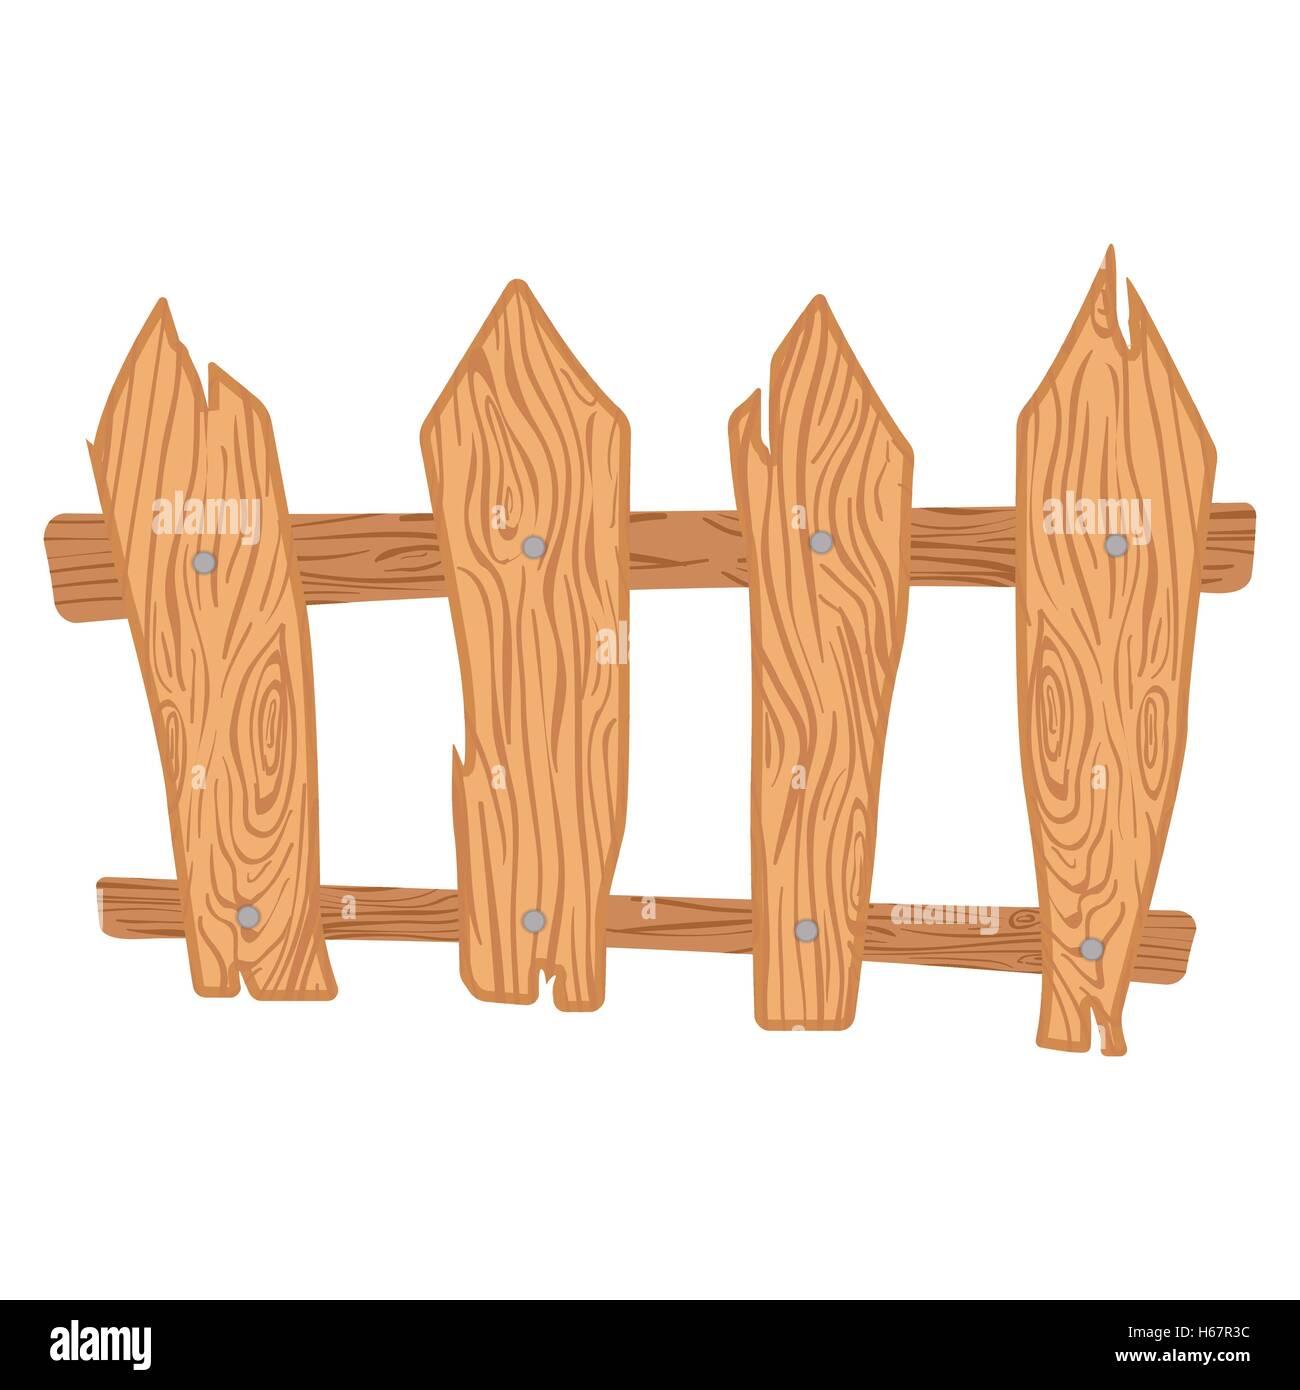 Zaun Aus Holz Cartoon Vektor Abbildung Bild 124332304 Alamy